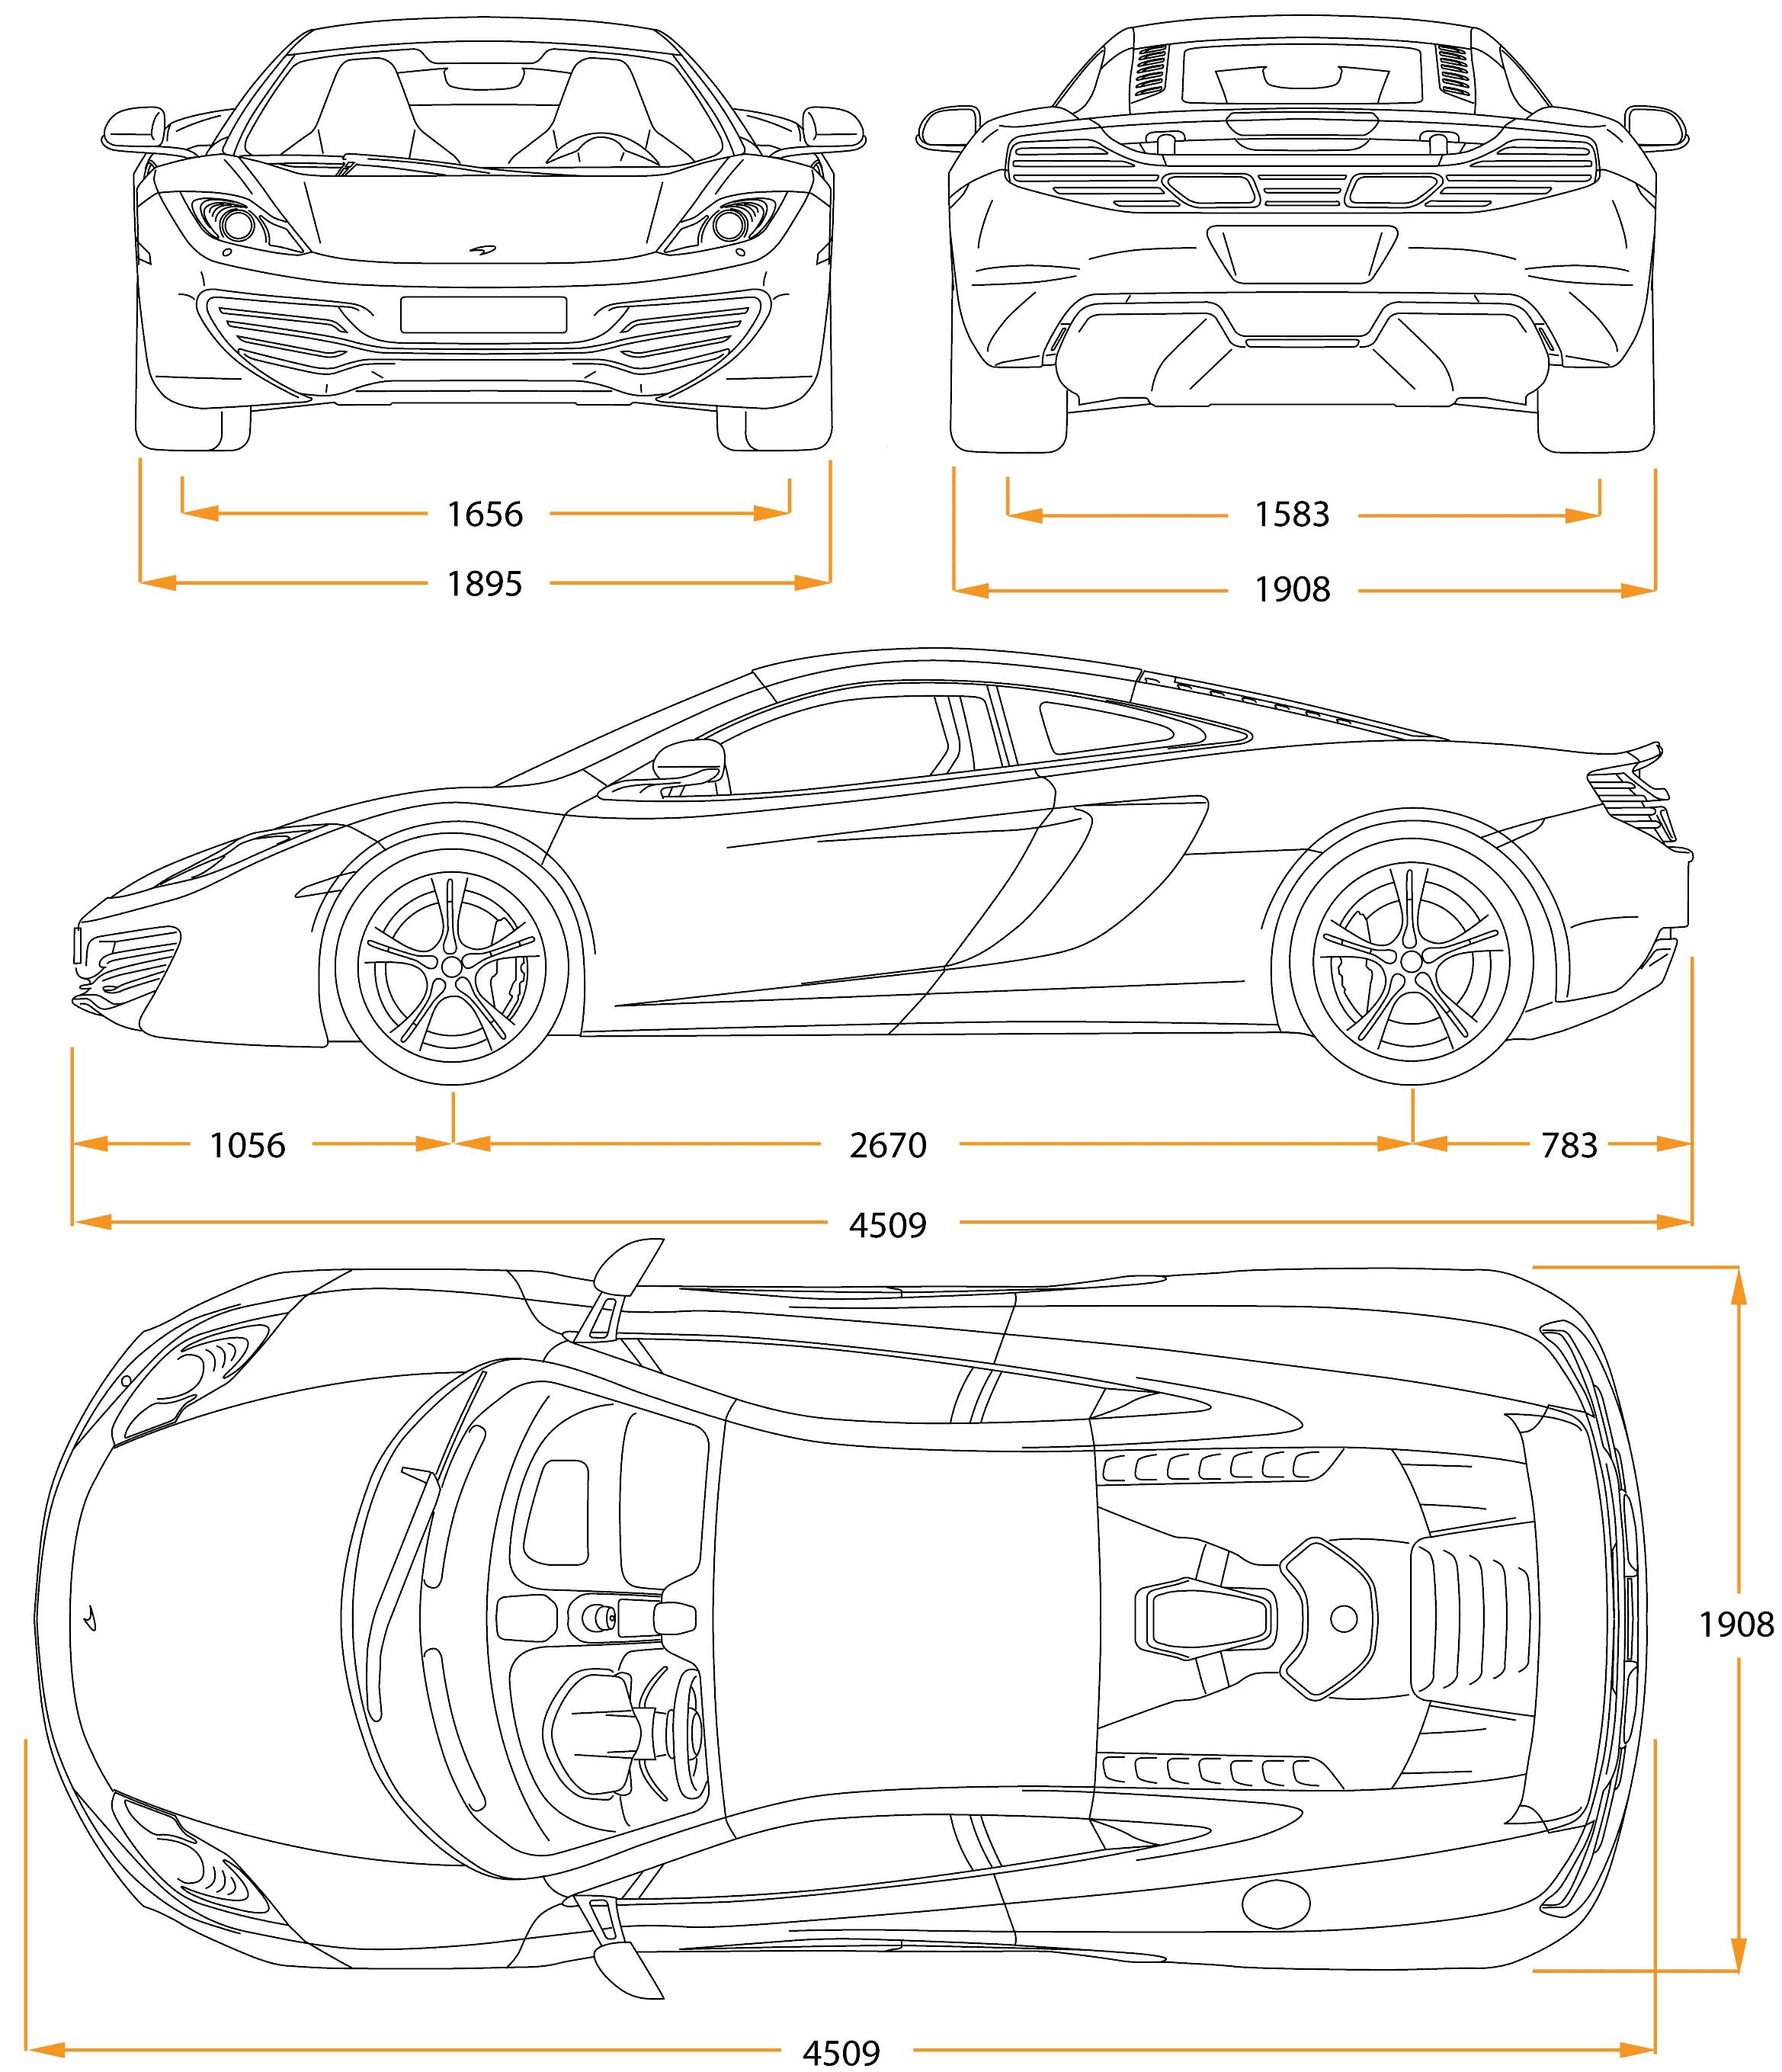 McLaren MP4-12C Blueprint - Download free blueprint for 3D ...